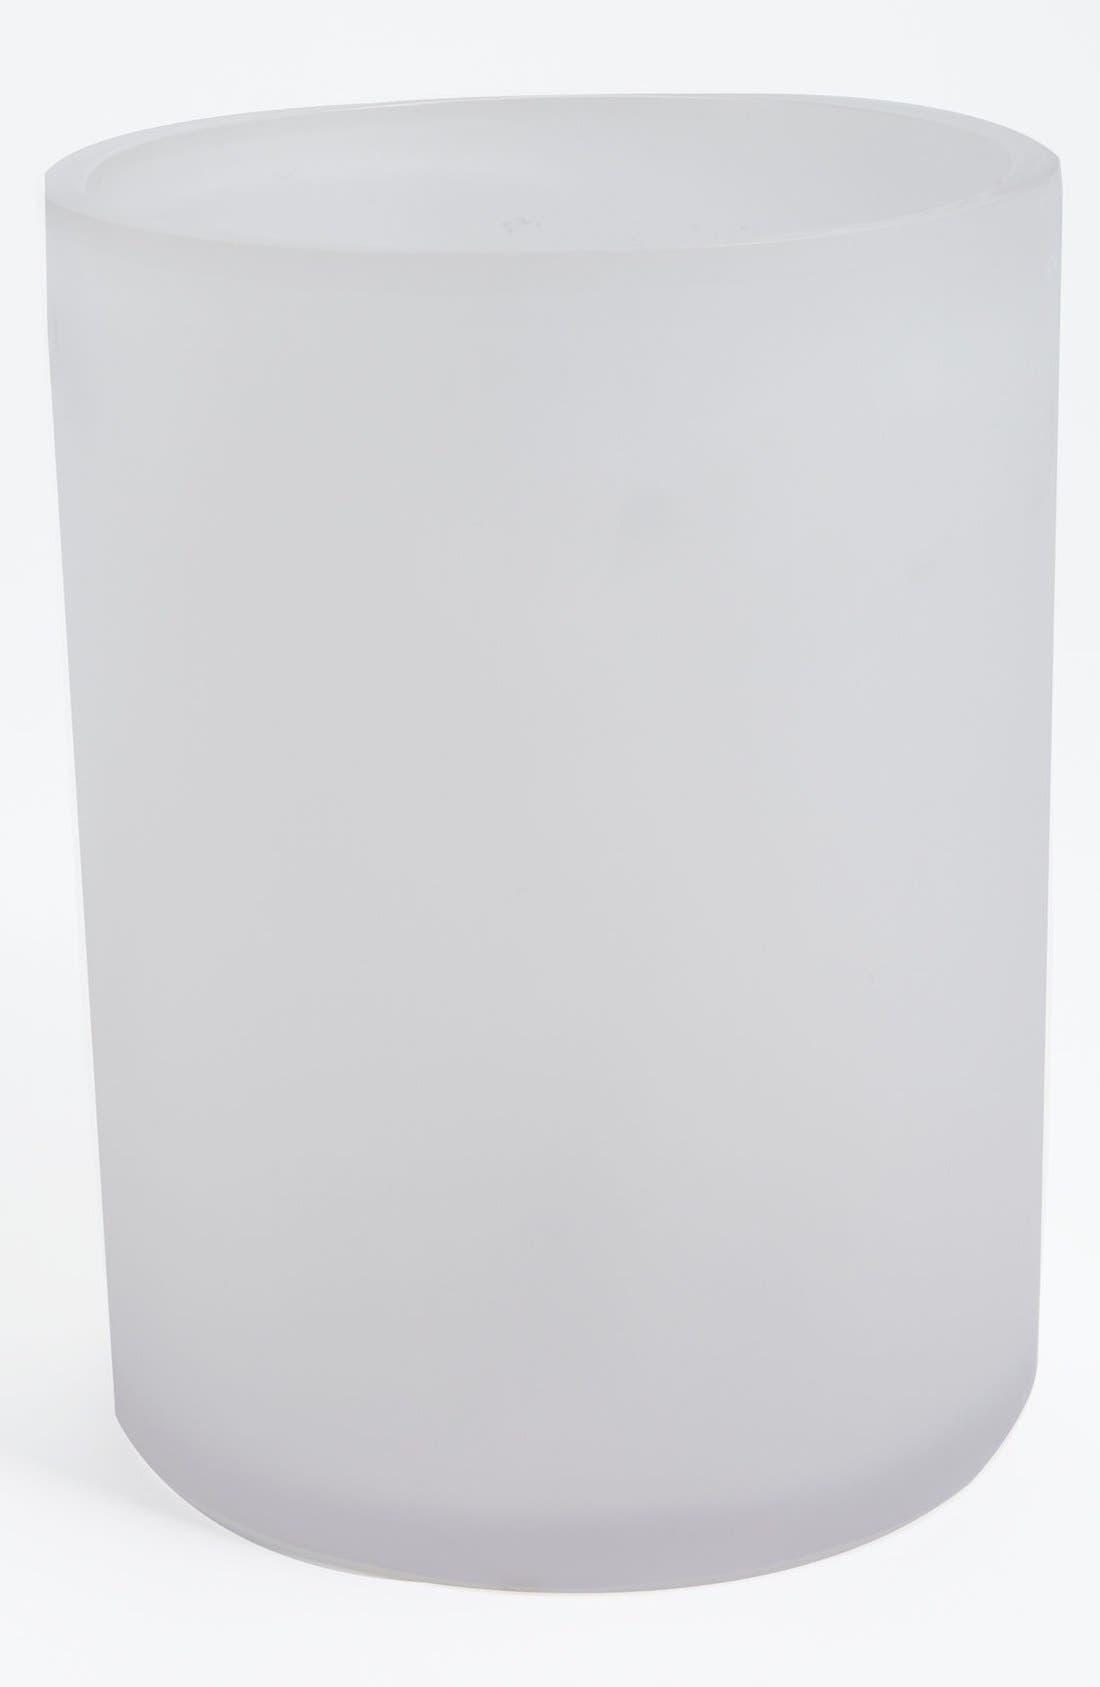 Alternate Image 1 Selected - Waterworks Studio 'Oxygen' Wastebasket (Online Only)